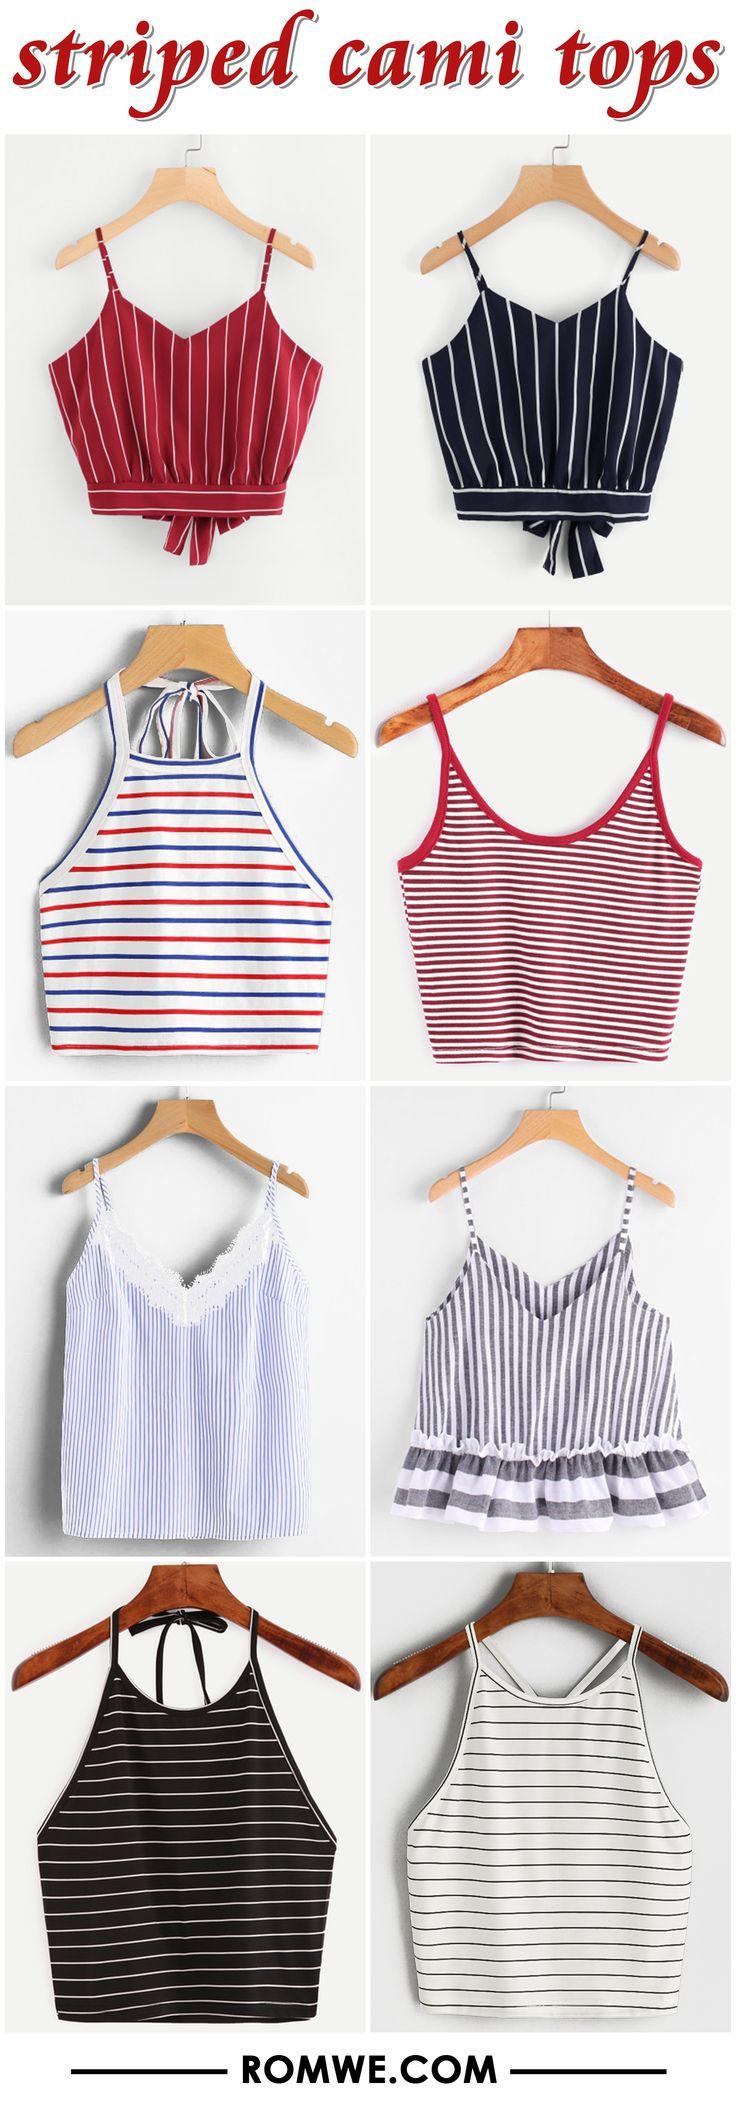 striped cami tops 2017 - romwe.com